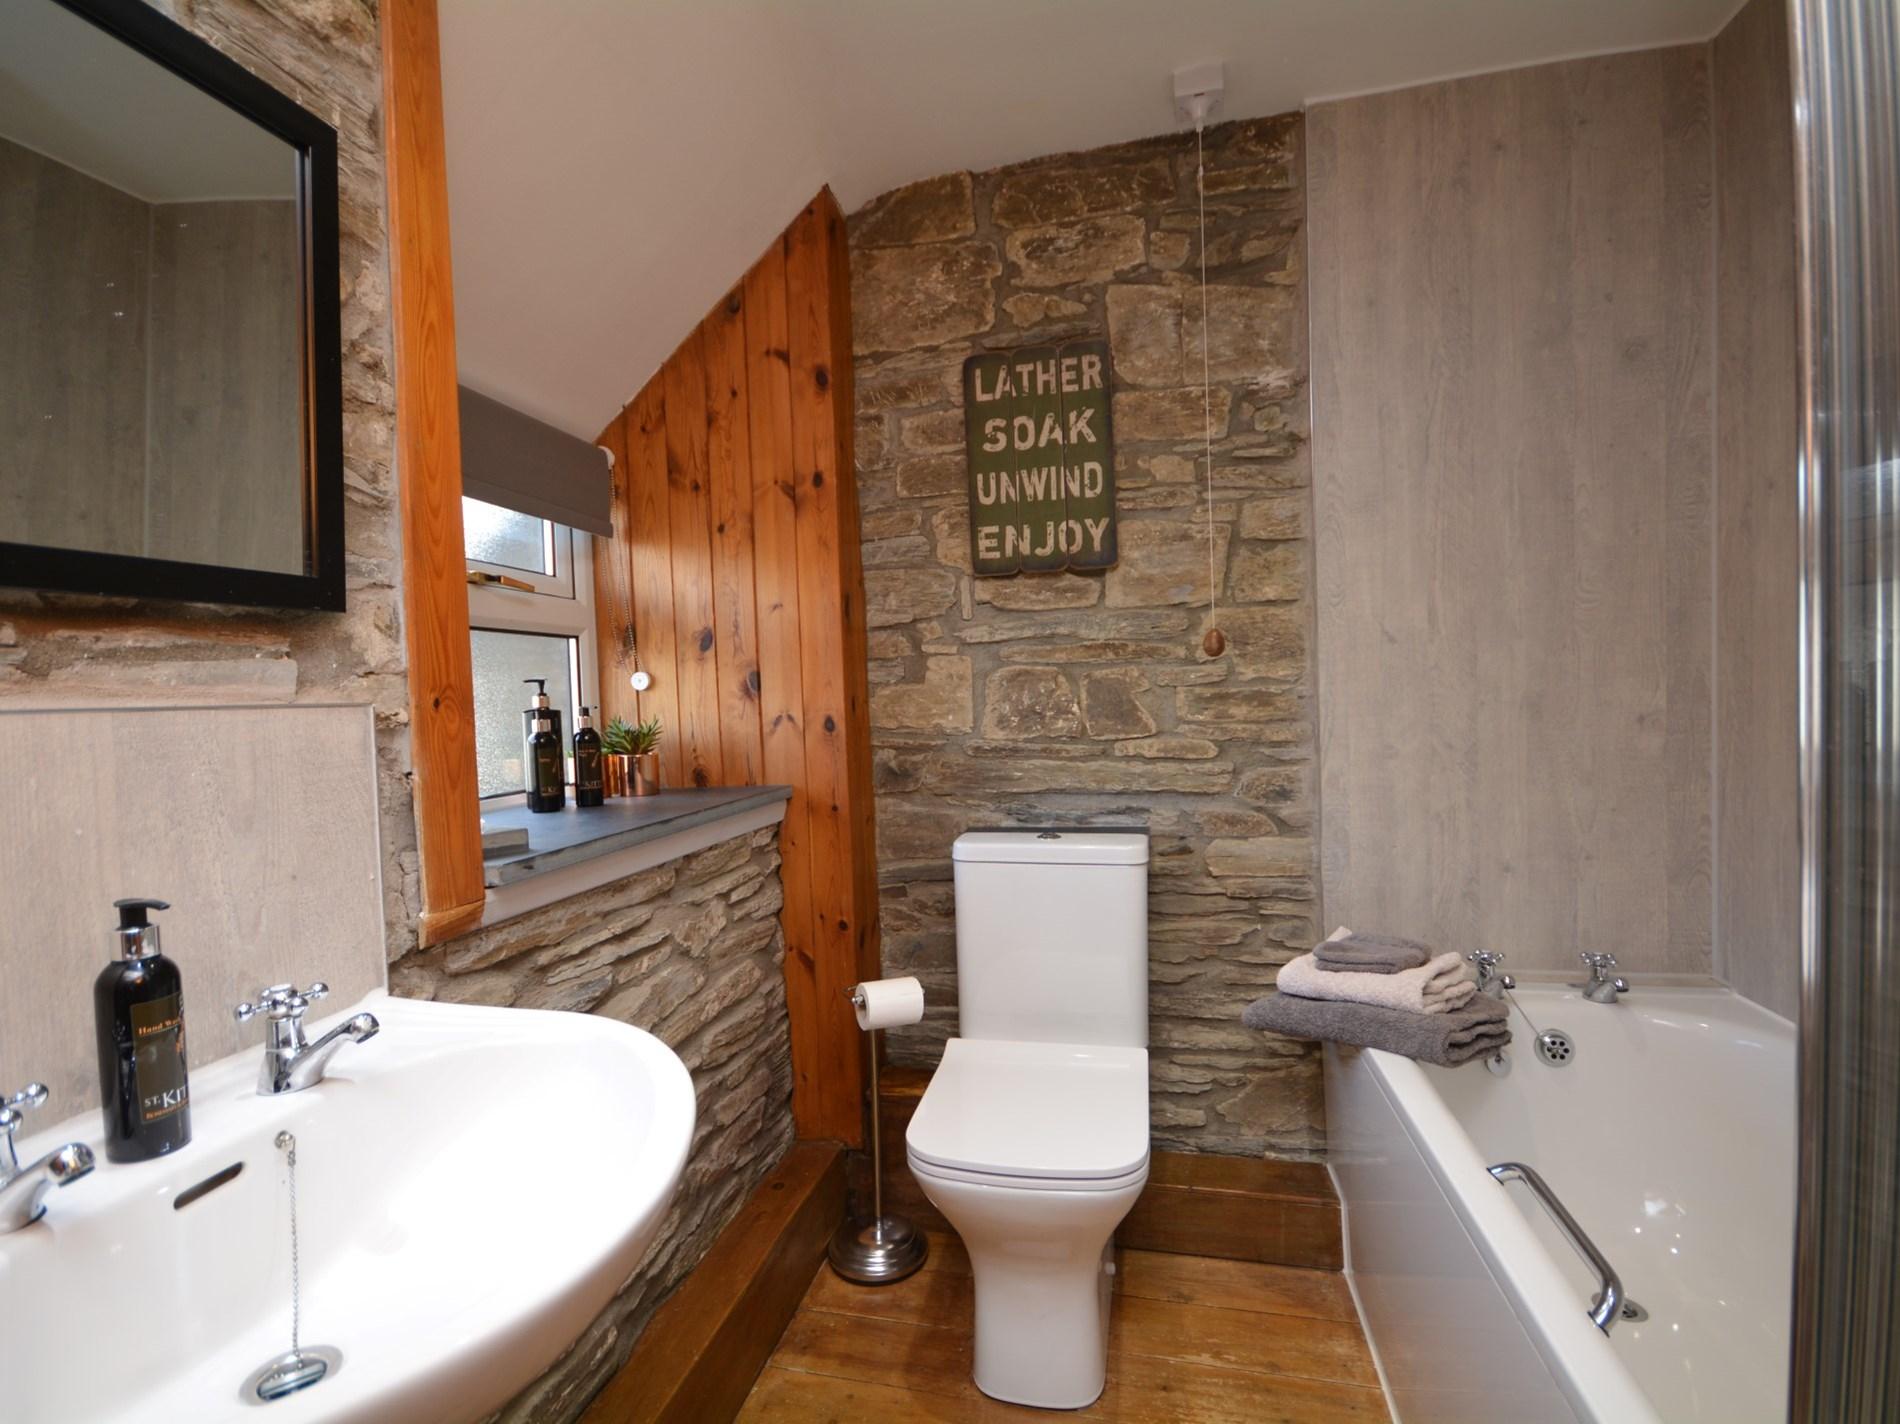 2 Bedroom Cottage in Liskeard, Cornwall